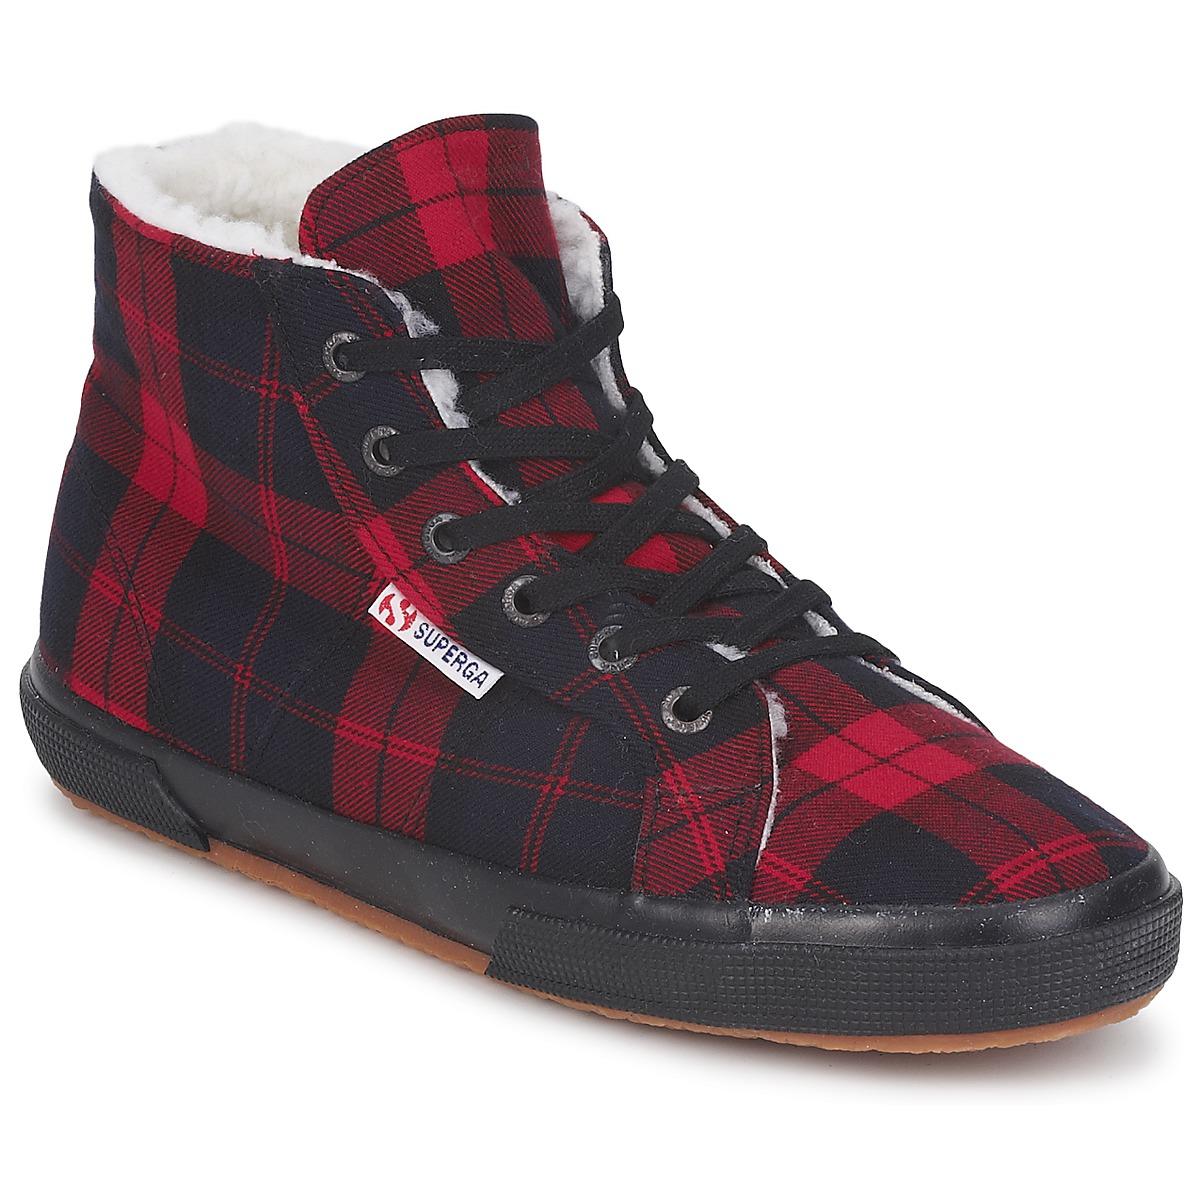 Superga 2095 Rot / Schwarz - Kostenloser Versand bei Spartoode ! - Schuhe Sneaker High  57,50 €